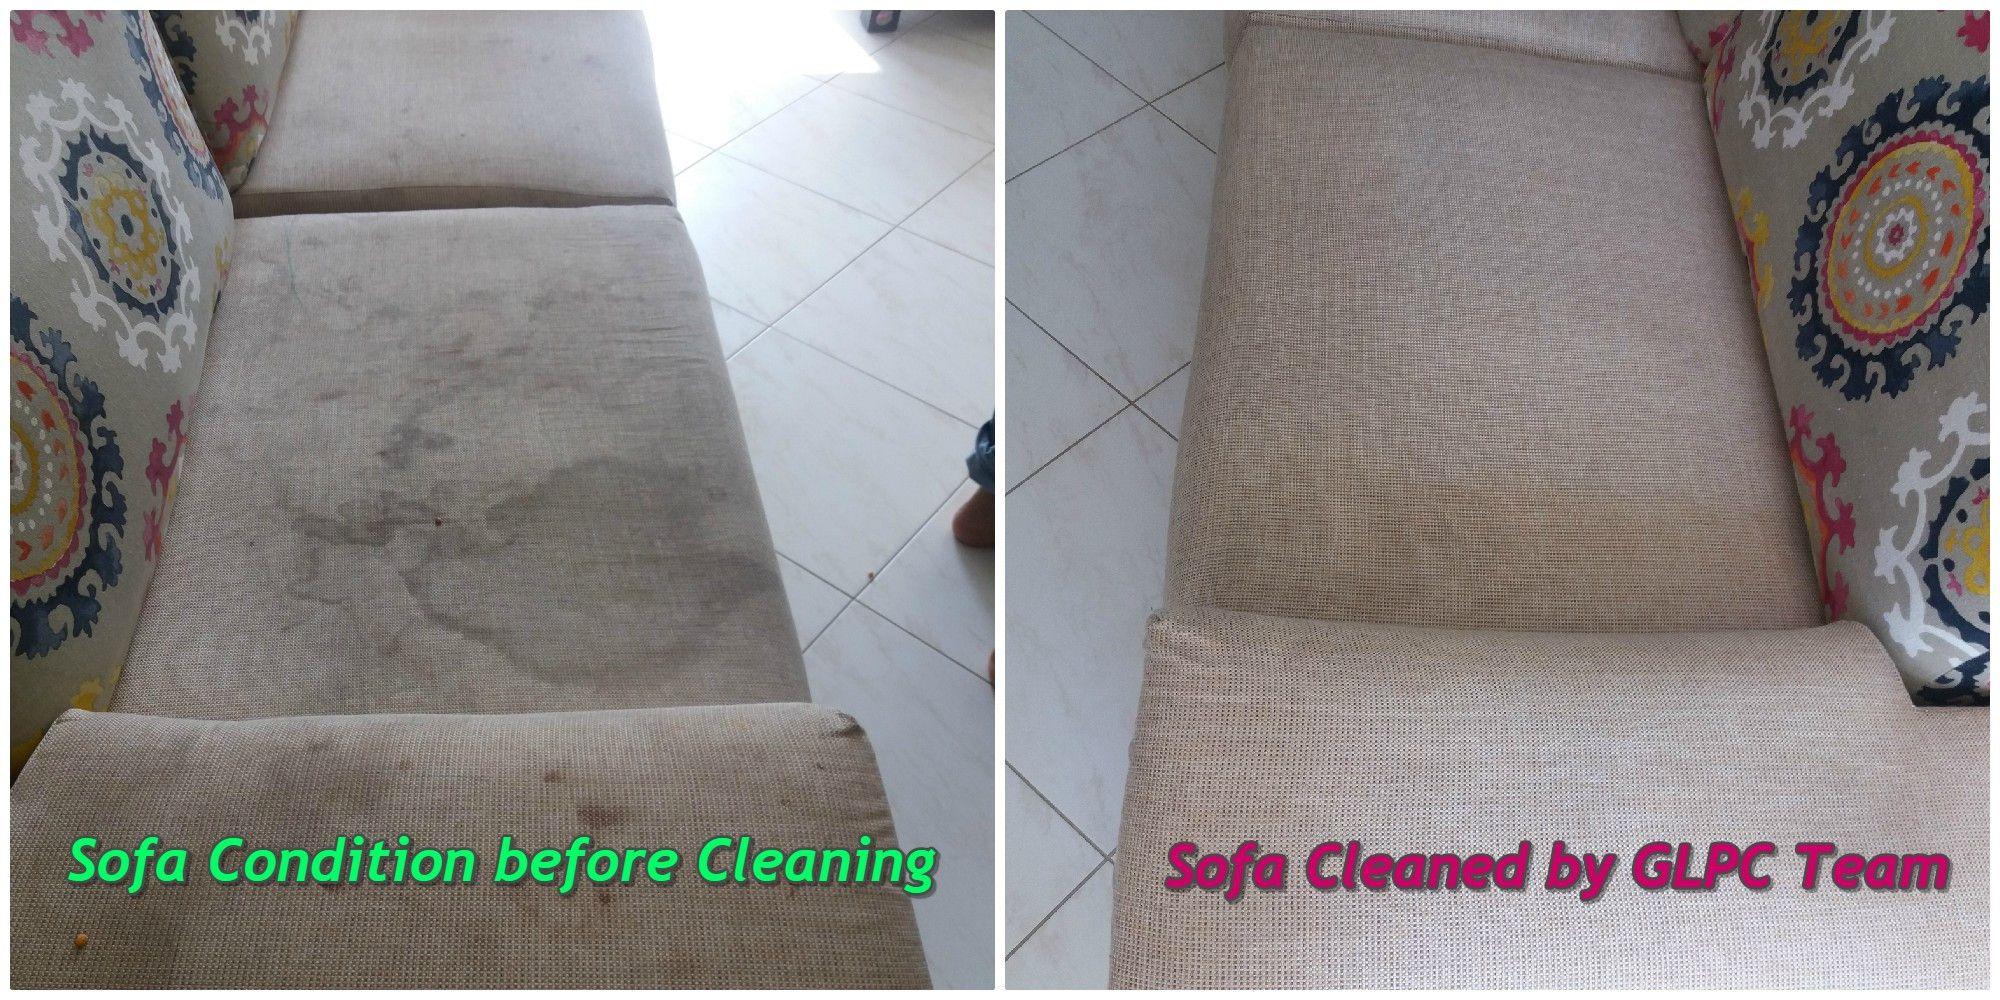 Golden Leaf Pest Control & Cleaning 0